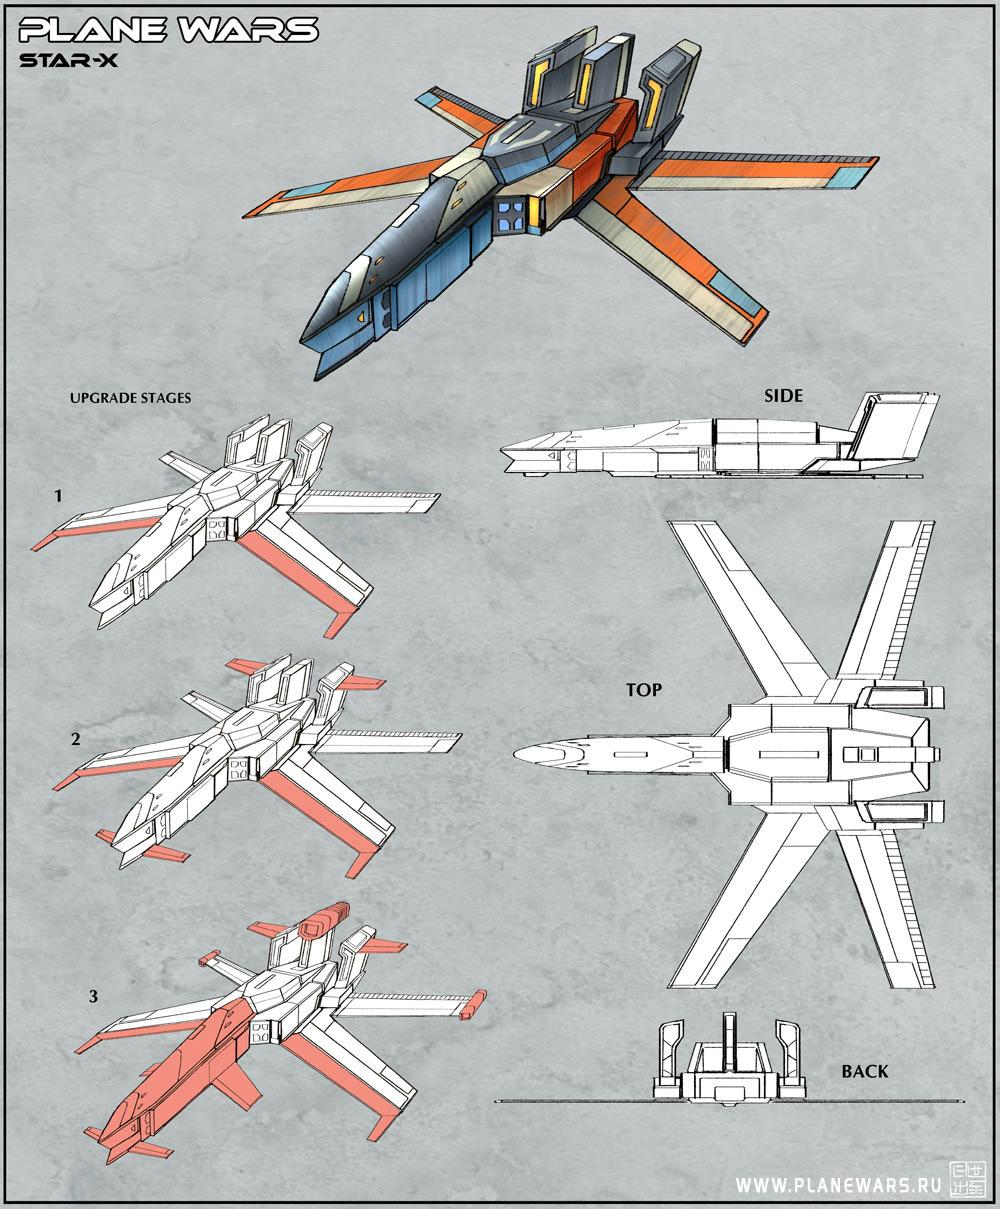 Plane Wars - Star X by Hideyoshi